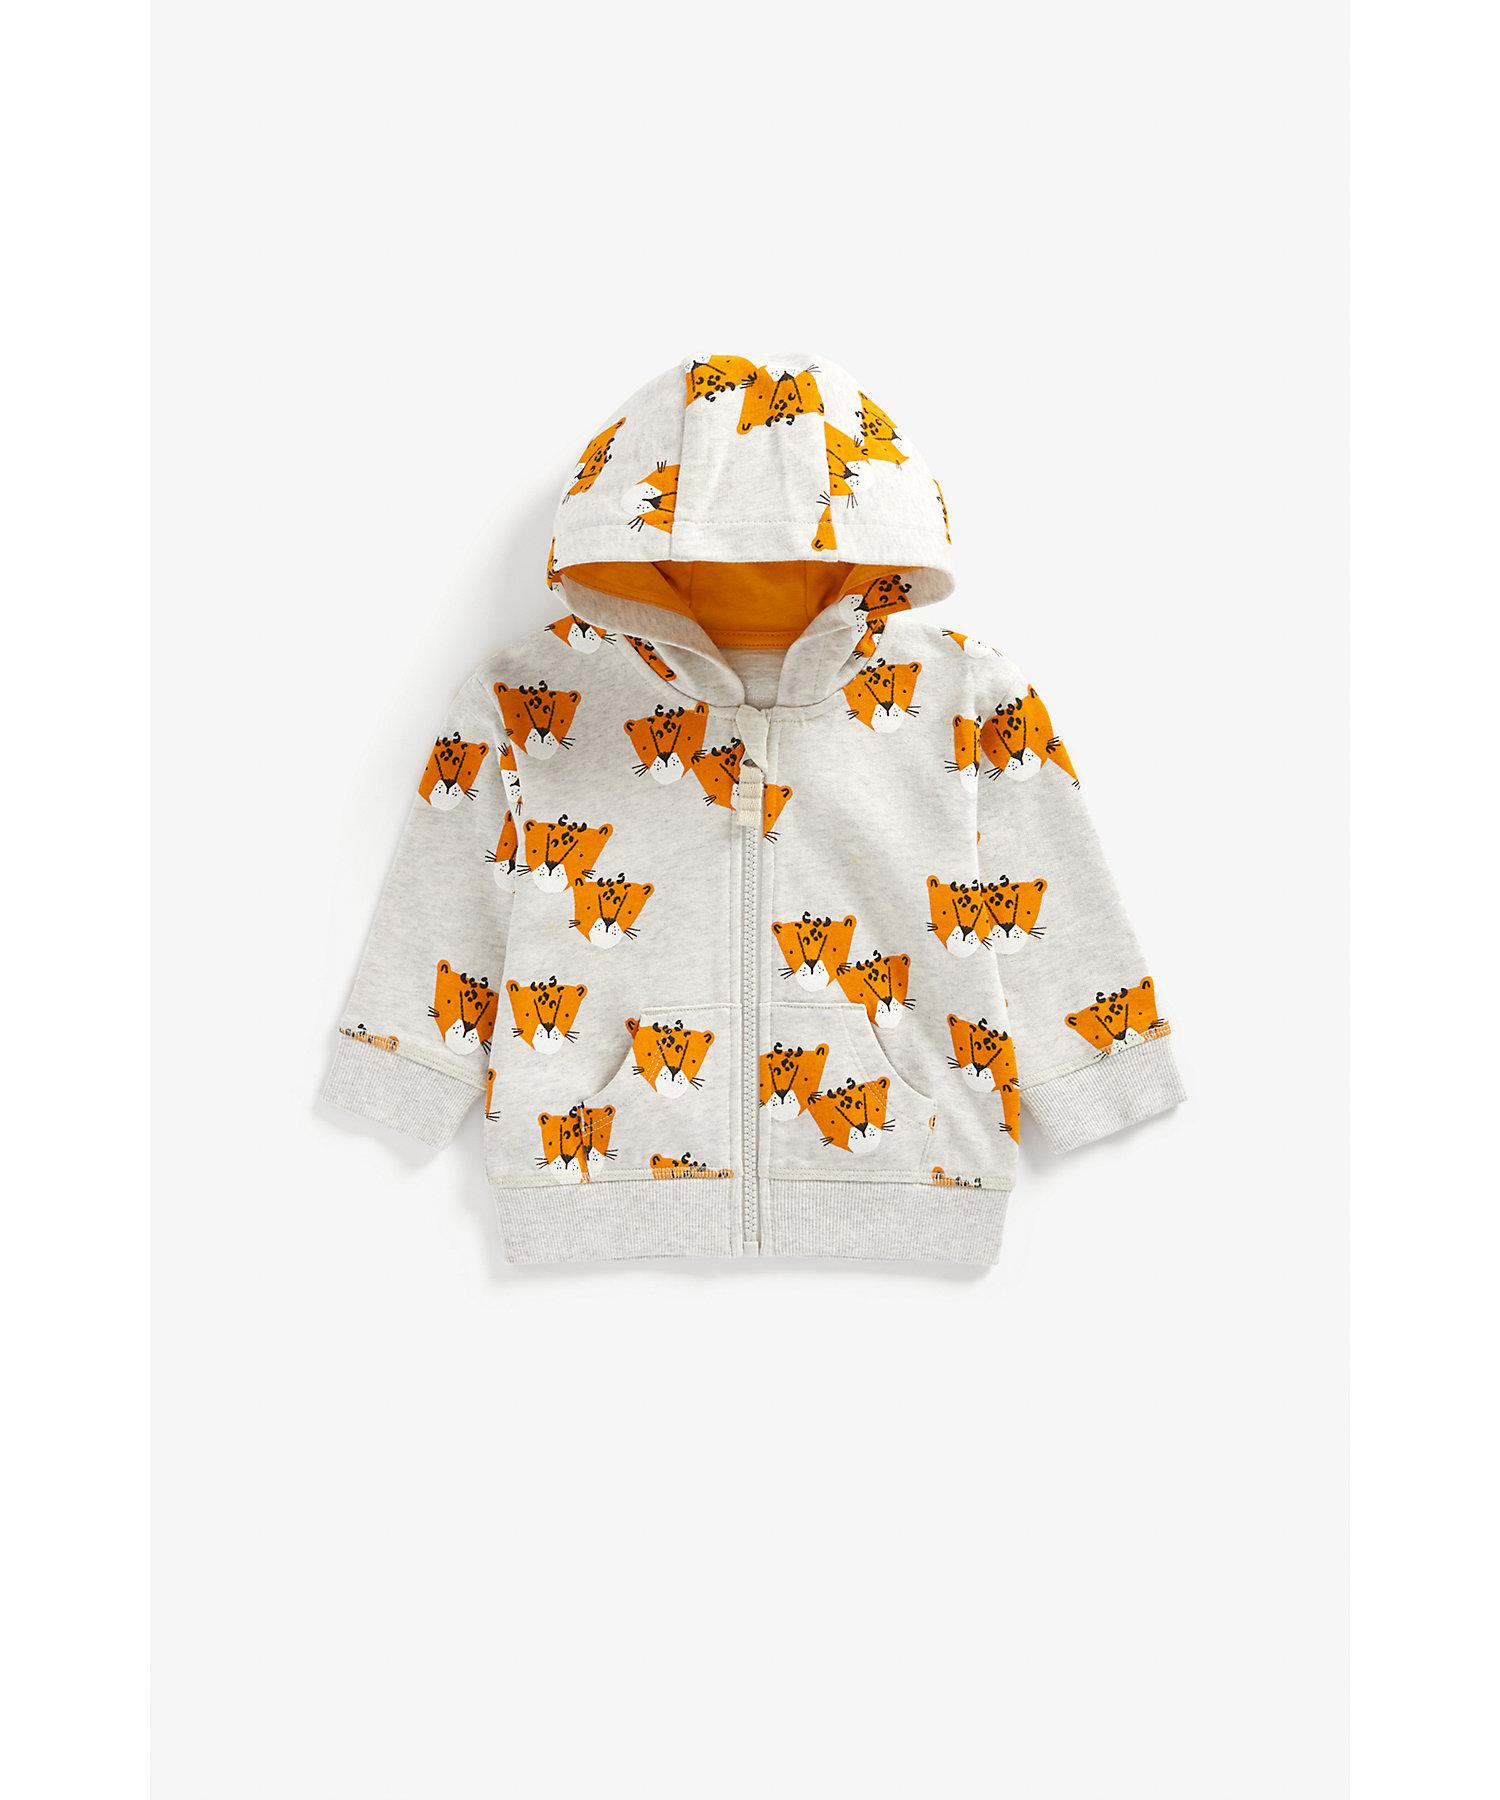 Mothercare | Boys Full Sleeves Hooded Sweatshirt Leopard Print - Grey